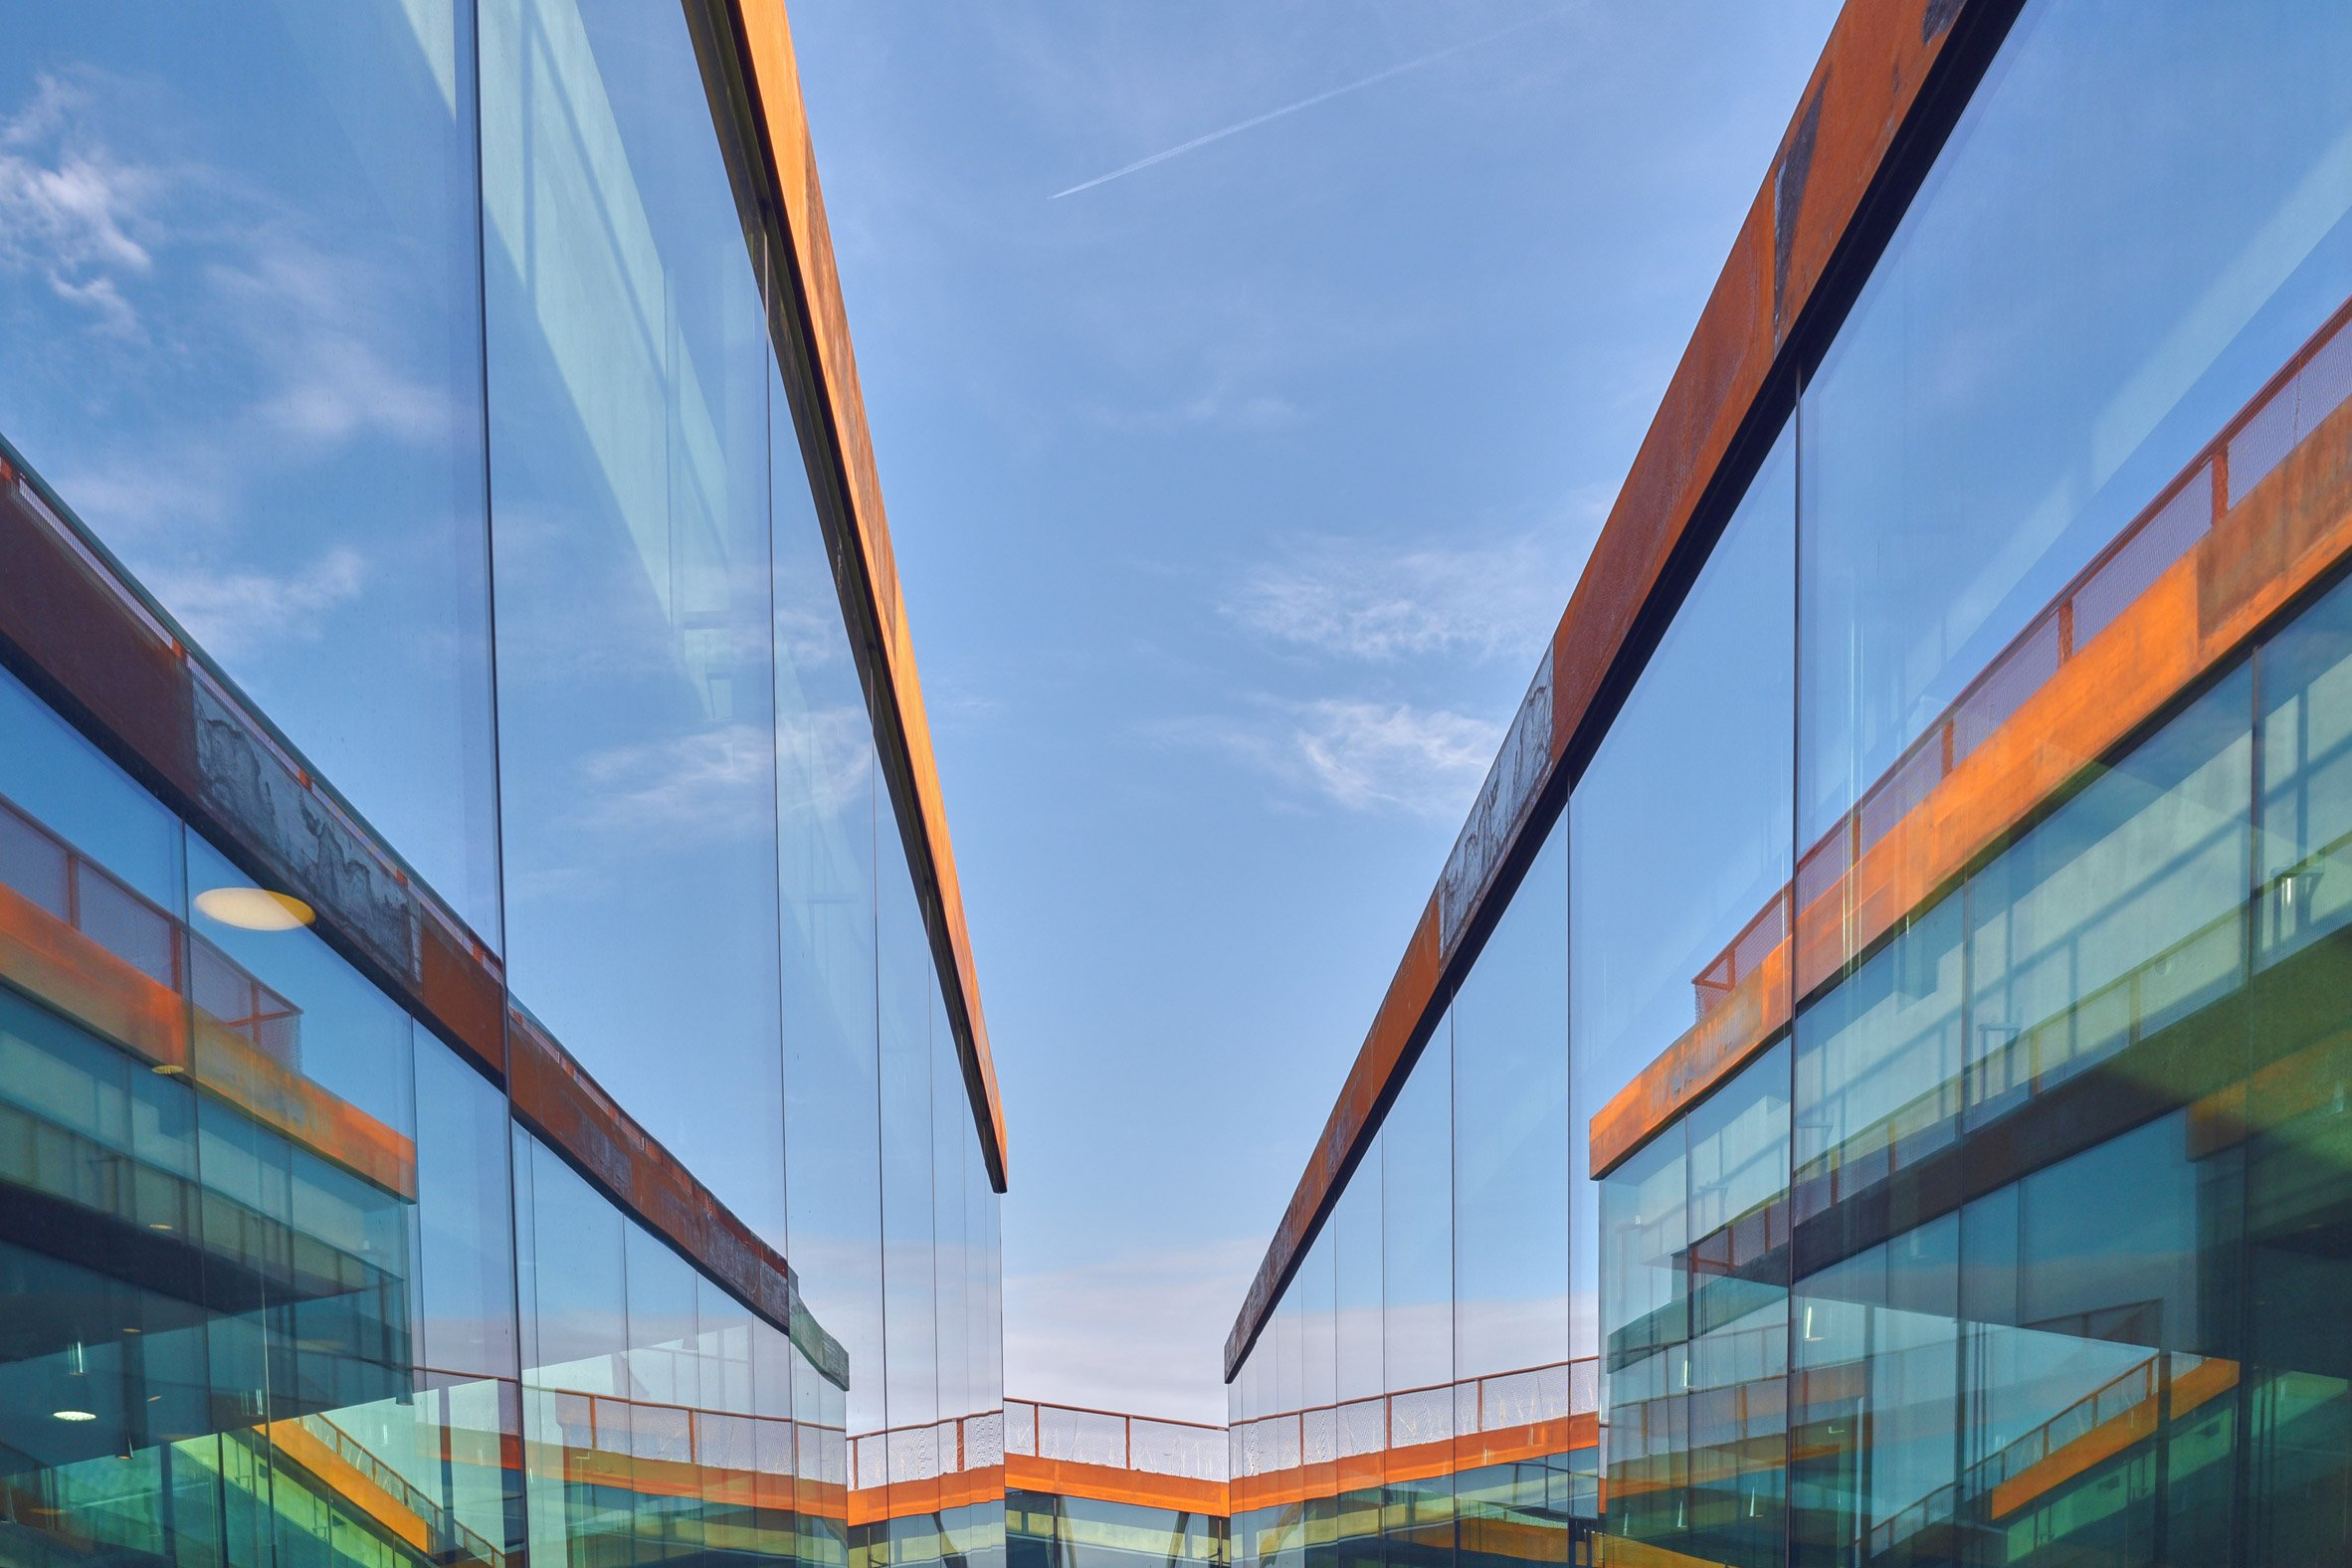 tirpitz-big-news-architecture-cultural-museum-denmark-_dezeen_2364_col_19-1